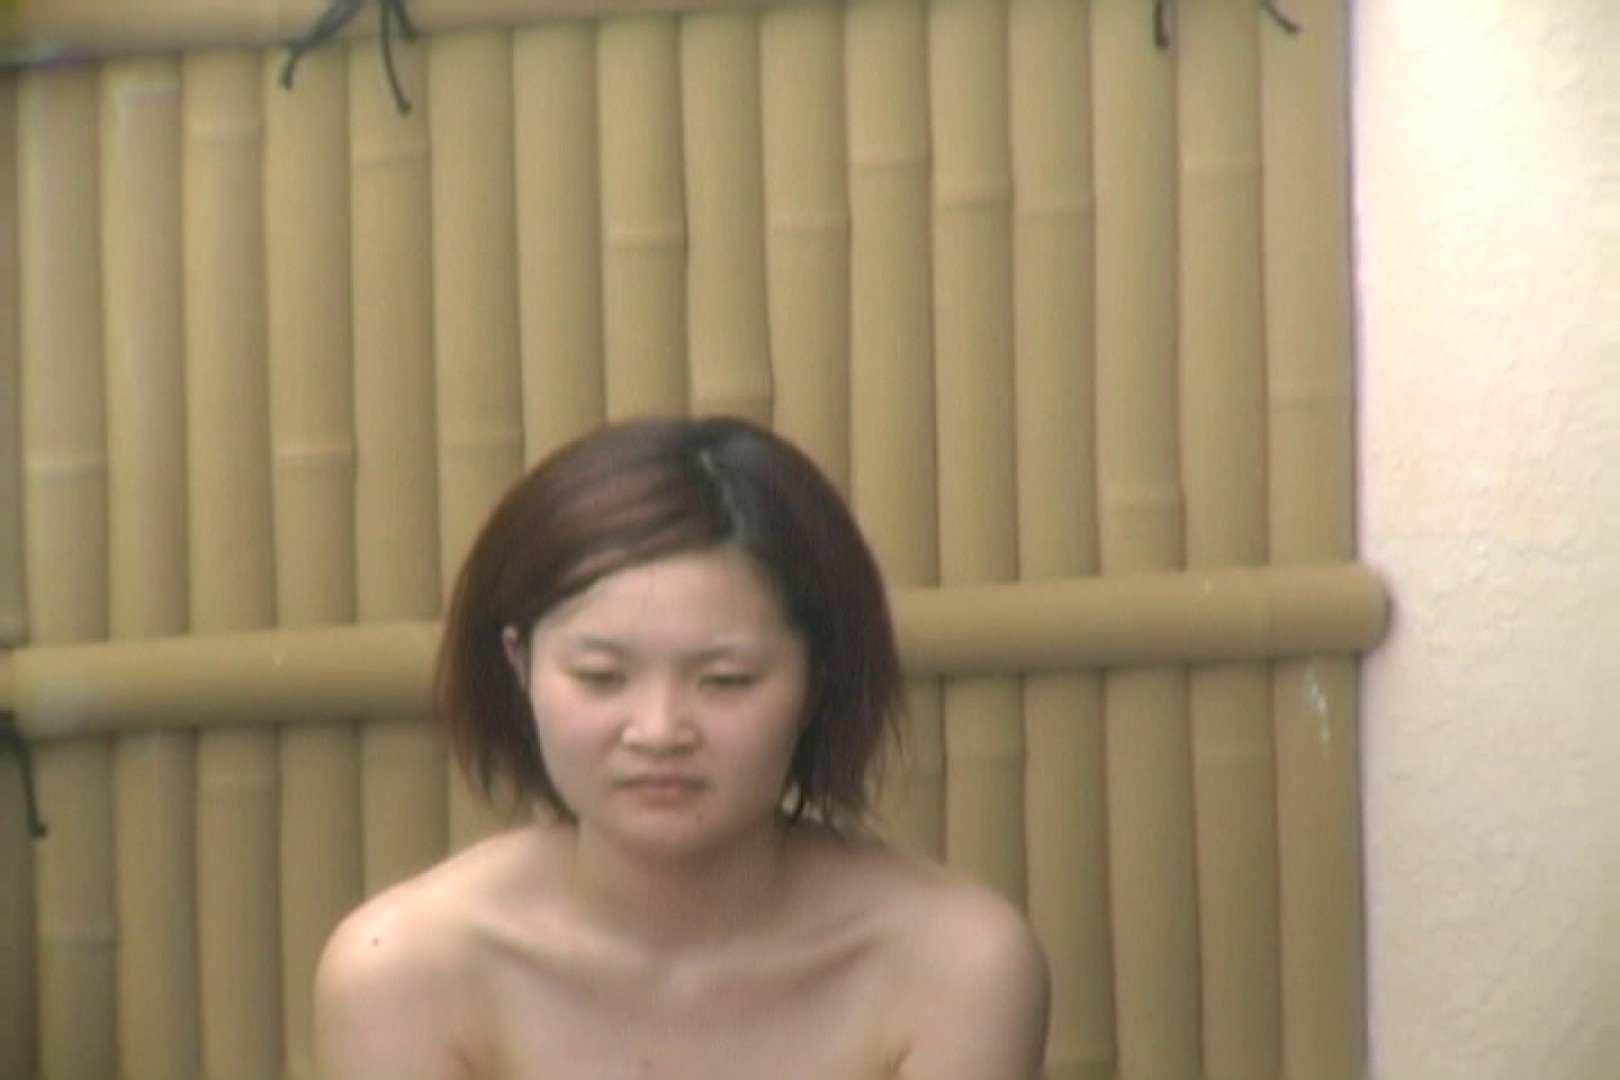 Aquaな露天風呂Vol.11【VIP】 盗撮シリーズ | 露天風呂編  112PIX 35